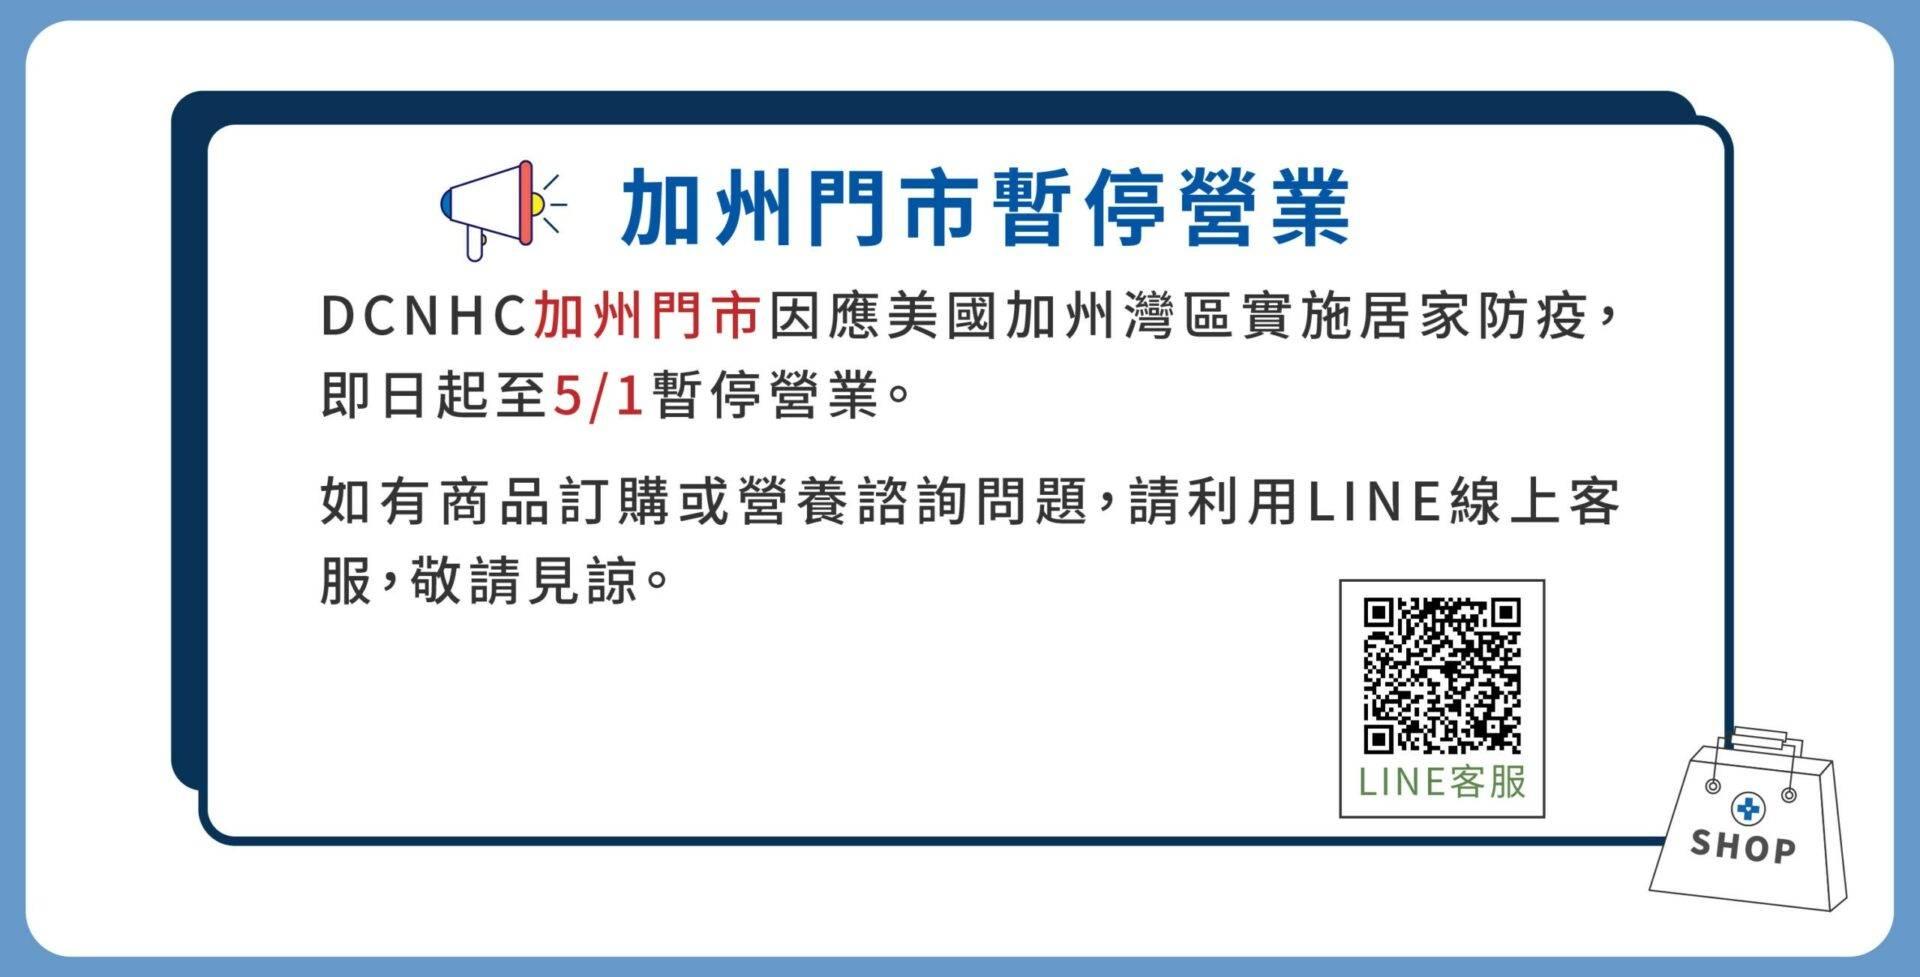 DCNHC – 美國自然醫學陳俊旭博士唯一認可